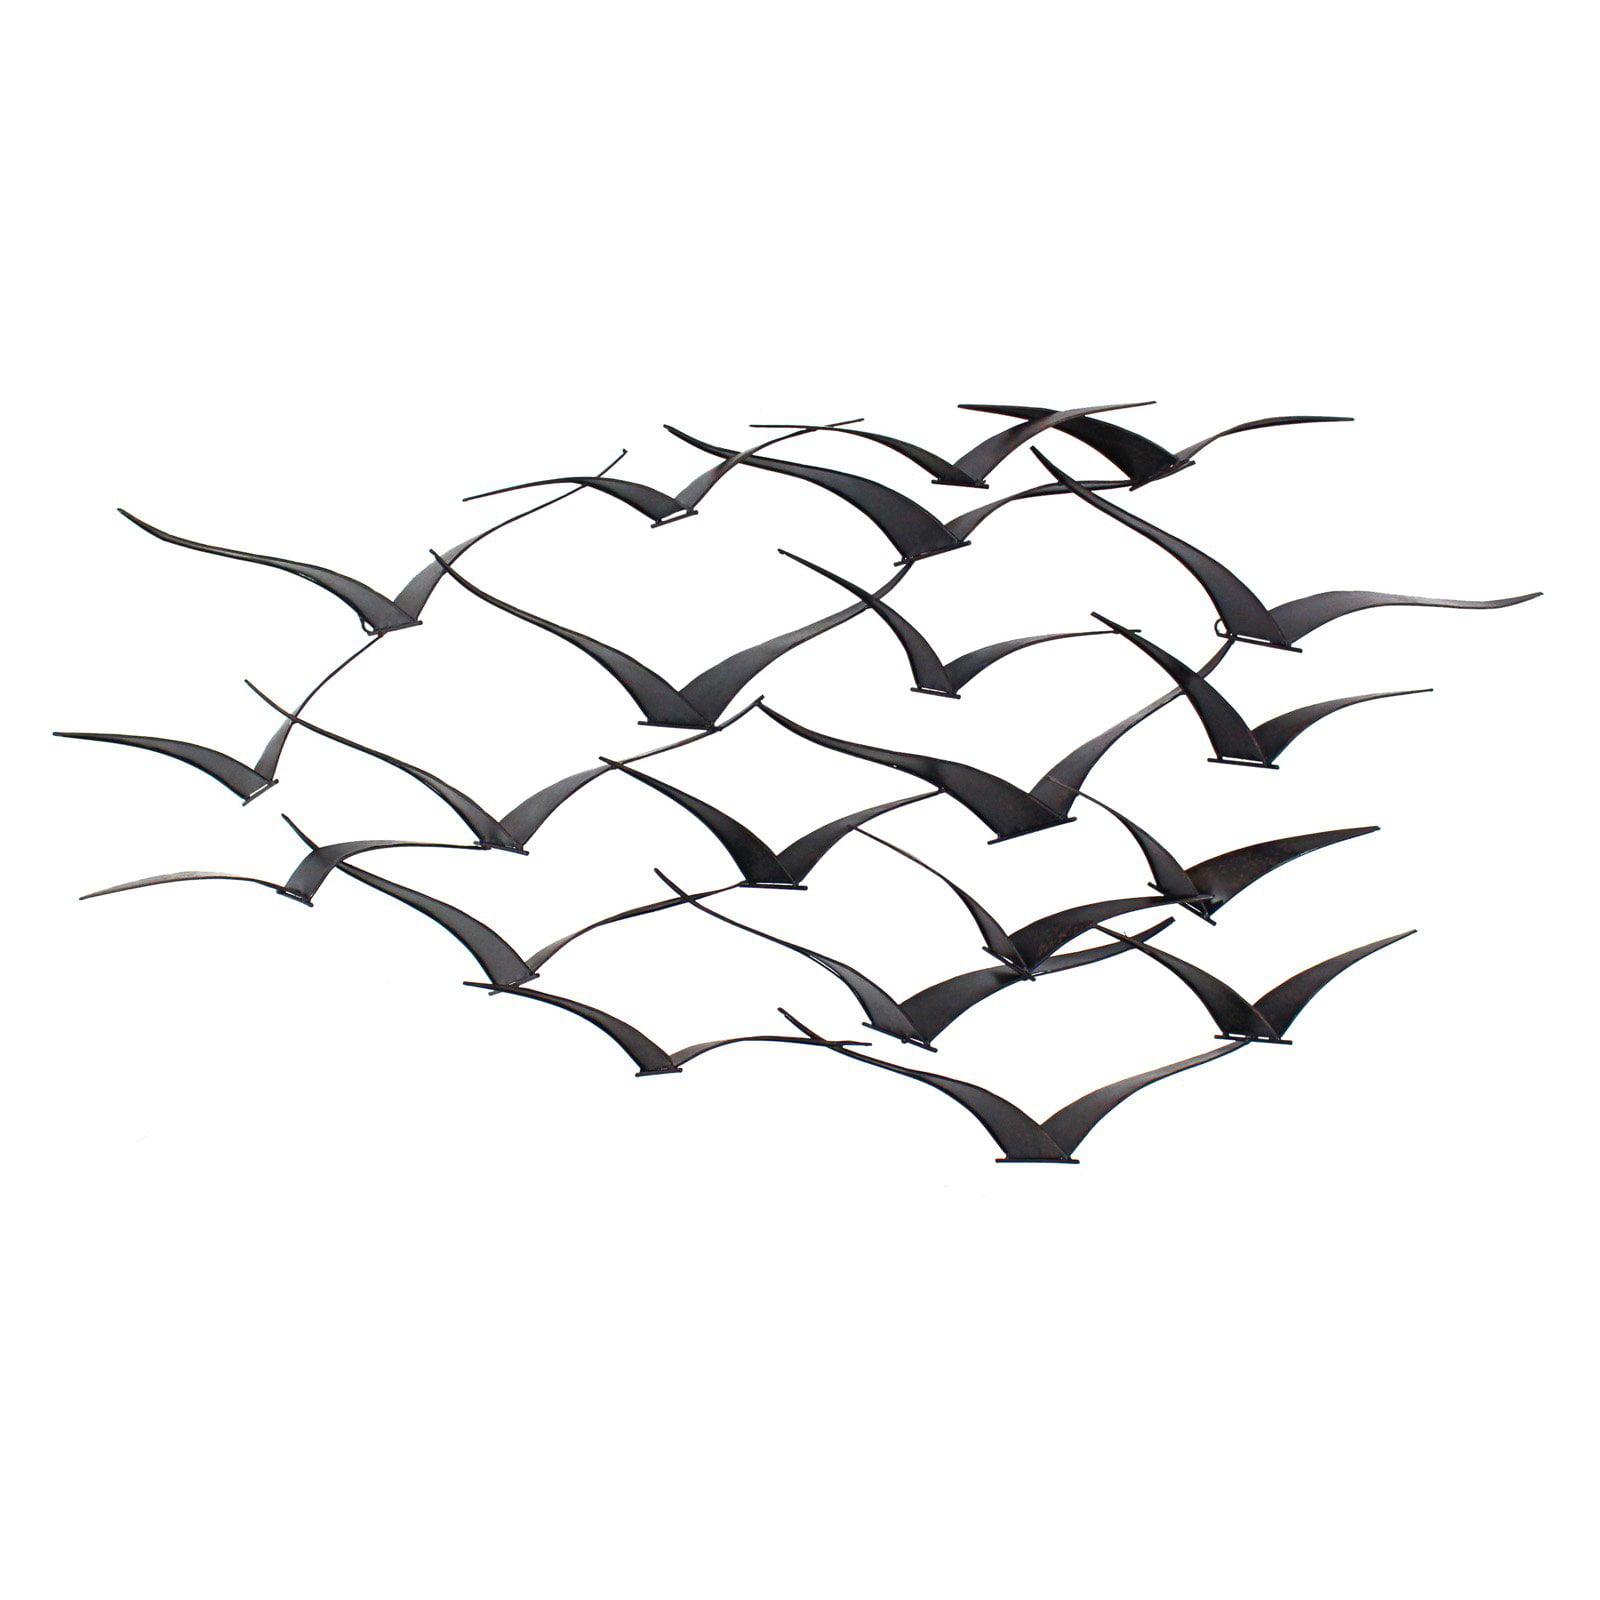 Darla Metal Birds Wall Decor by Aspire Home Accents